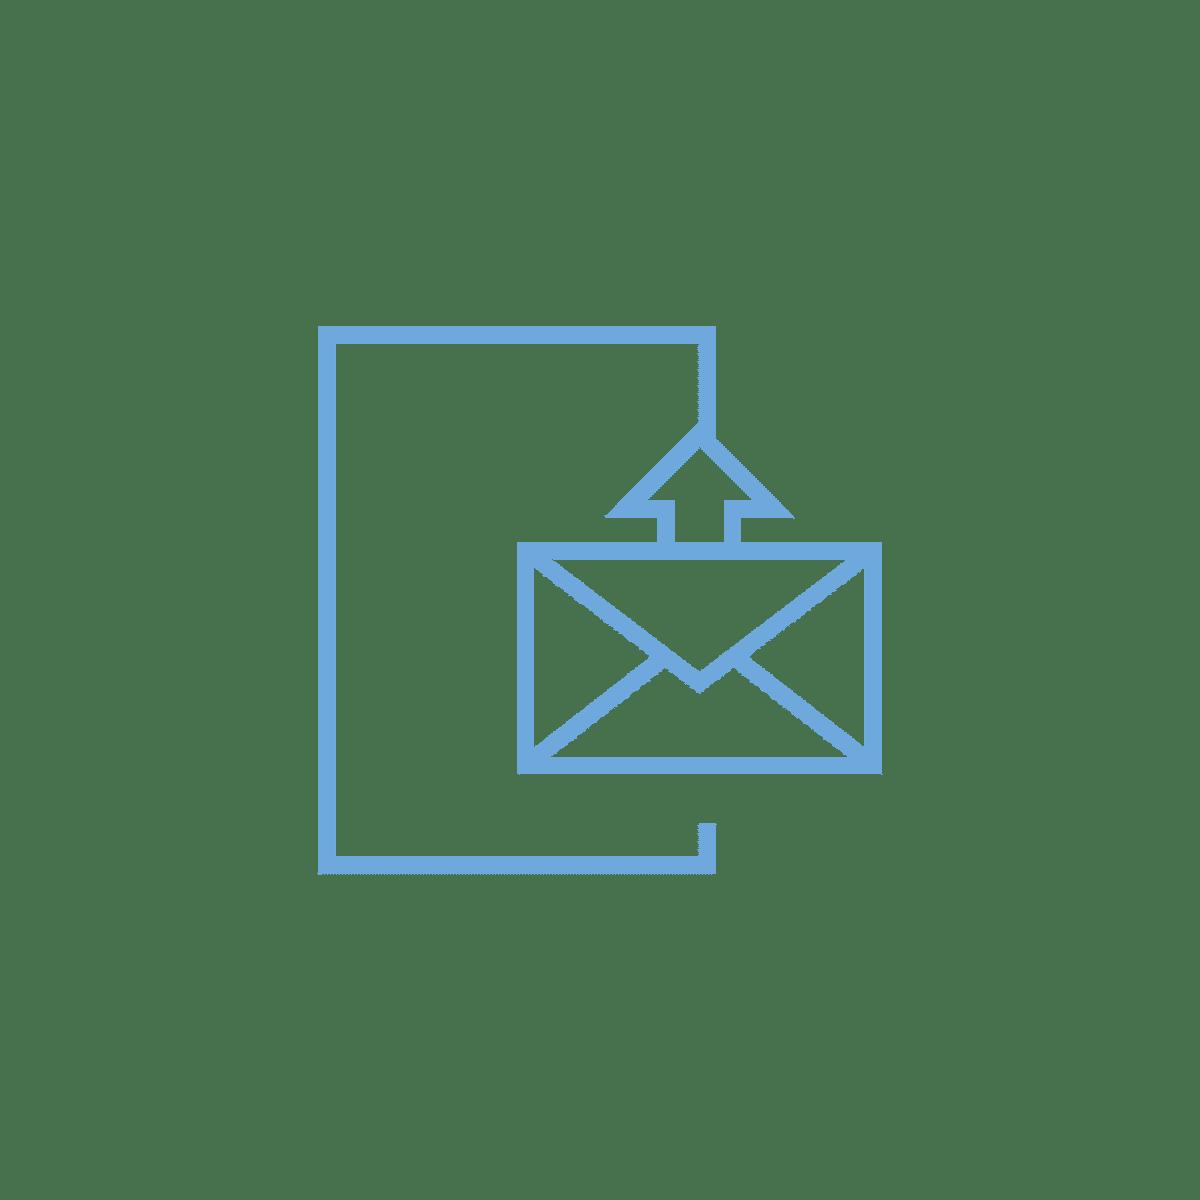 icon-send-documents